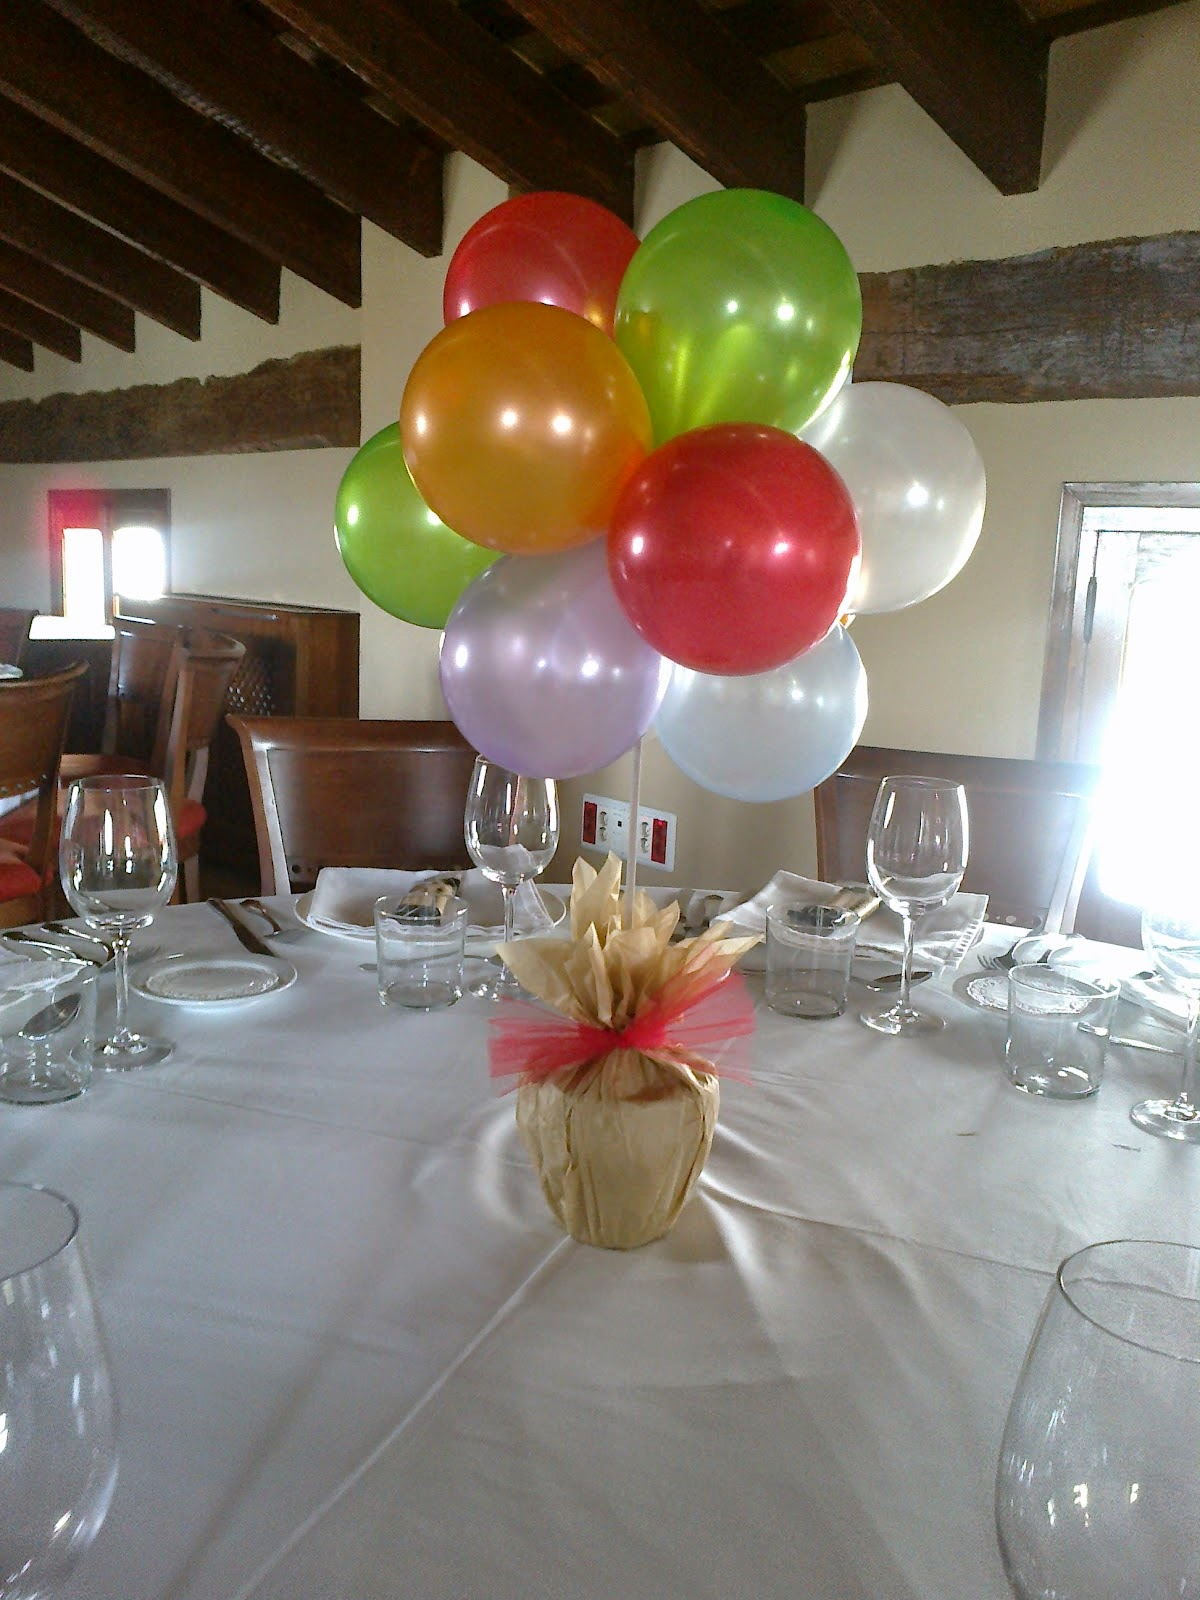 http://www.centrodemesa.org/2011/04/centro-de-mesa-para-comuniones.html?m=0